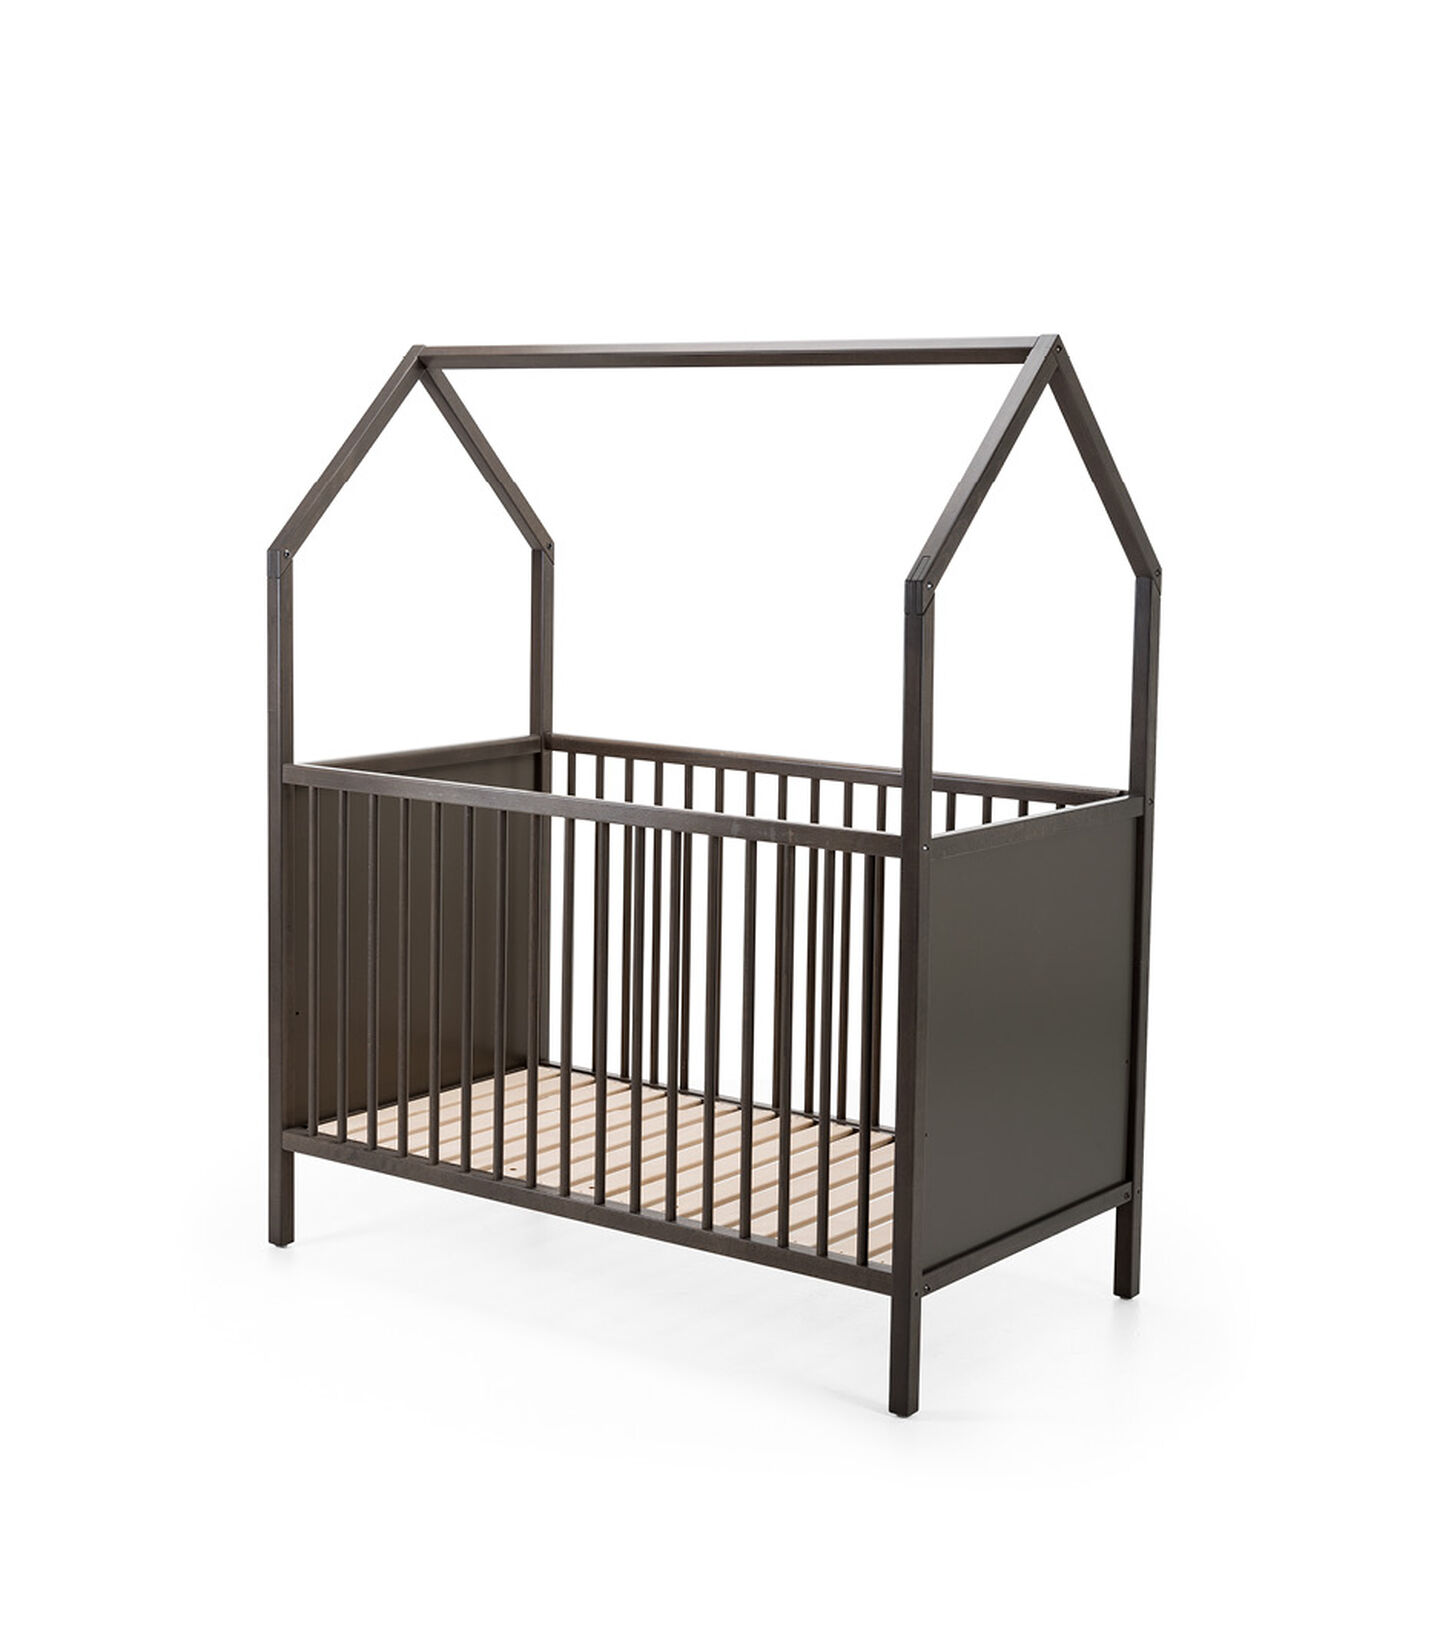 Stokke® Home™ Bed 1 von 2 Hazy Grey, Hazy Grey, mainview